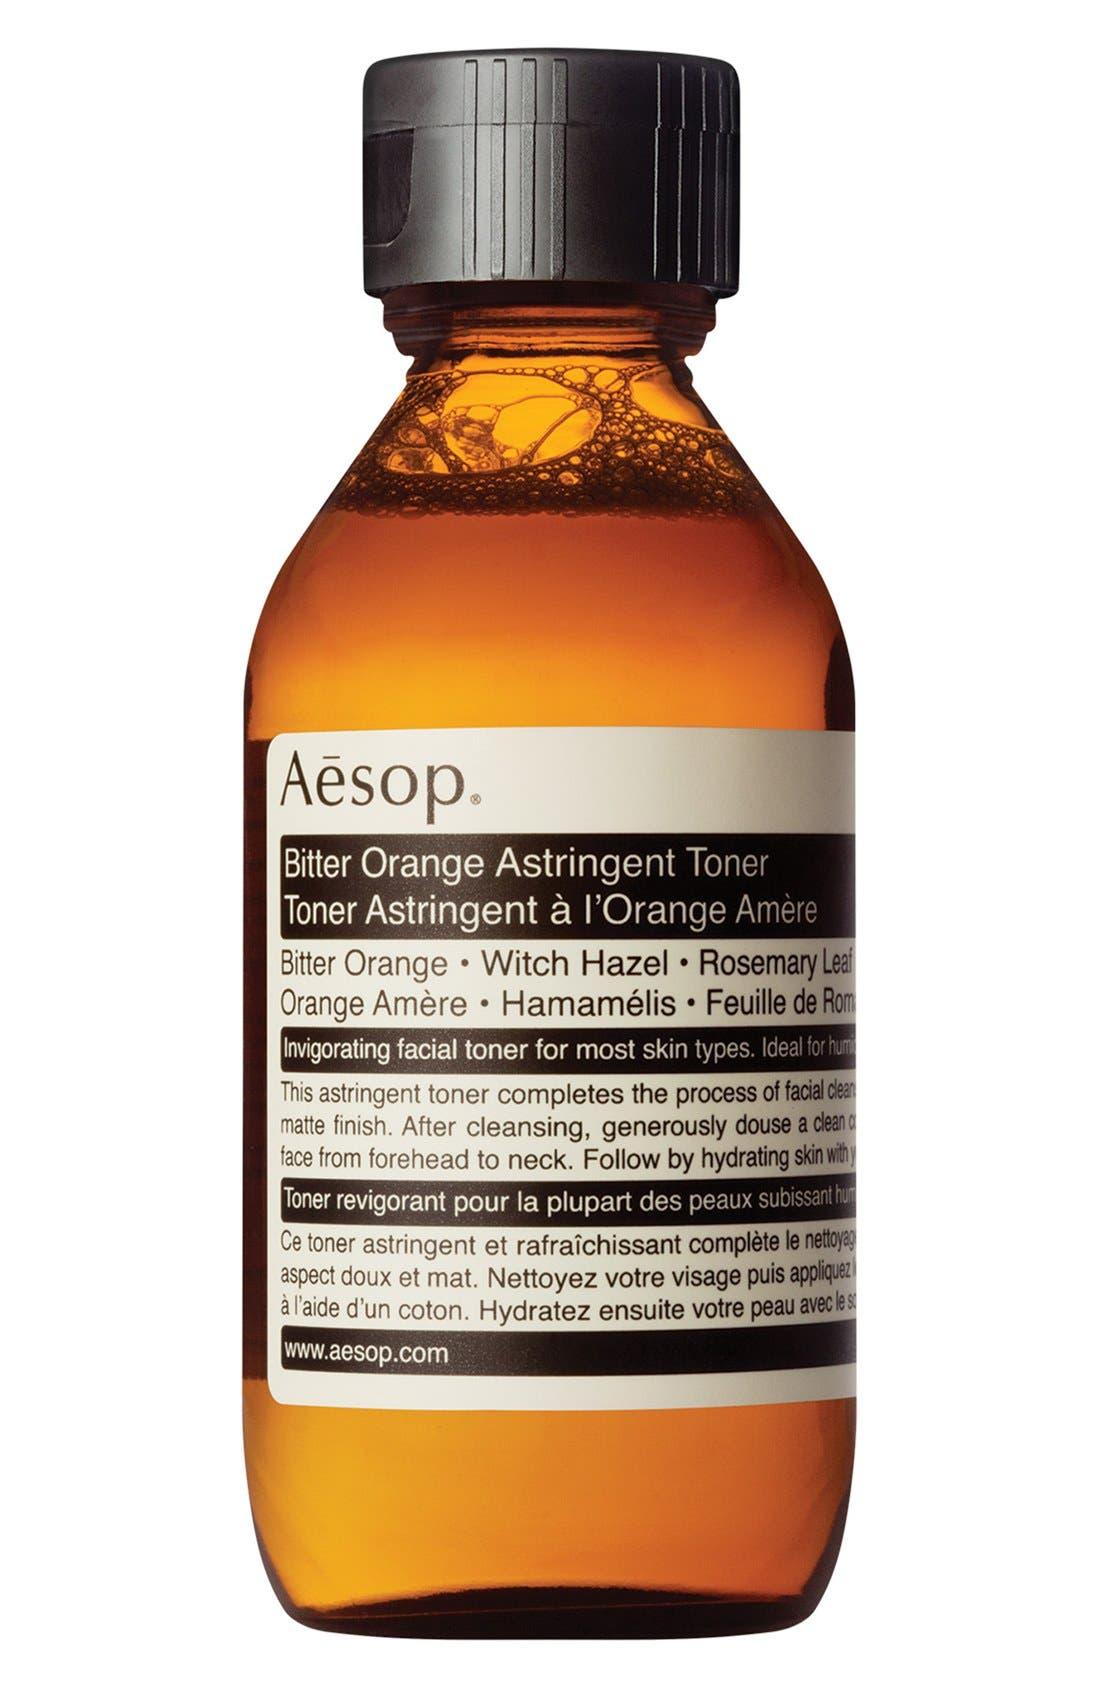 Aesop Bitter Orange Astringent Toner